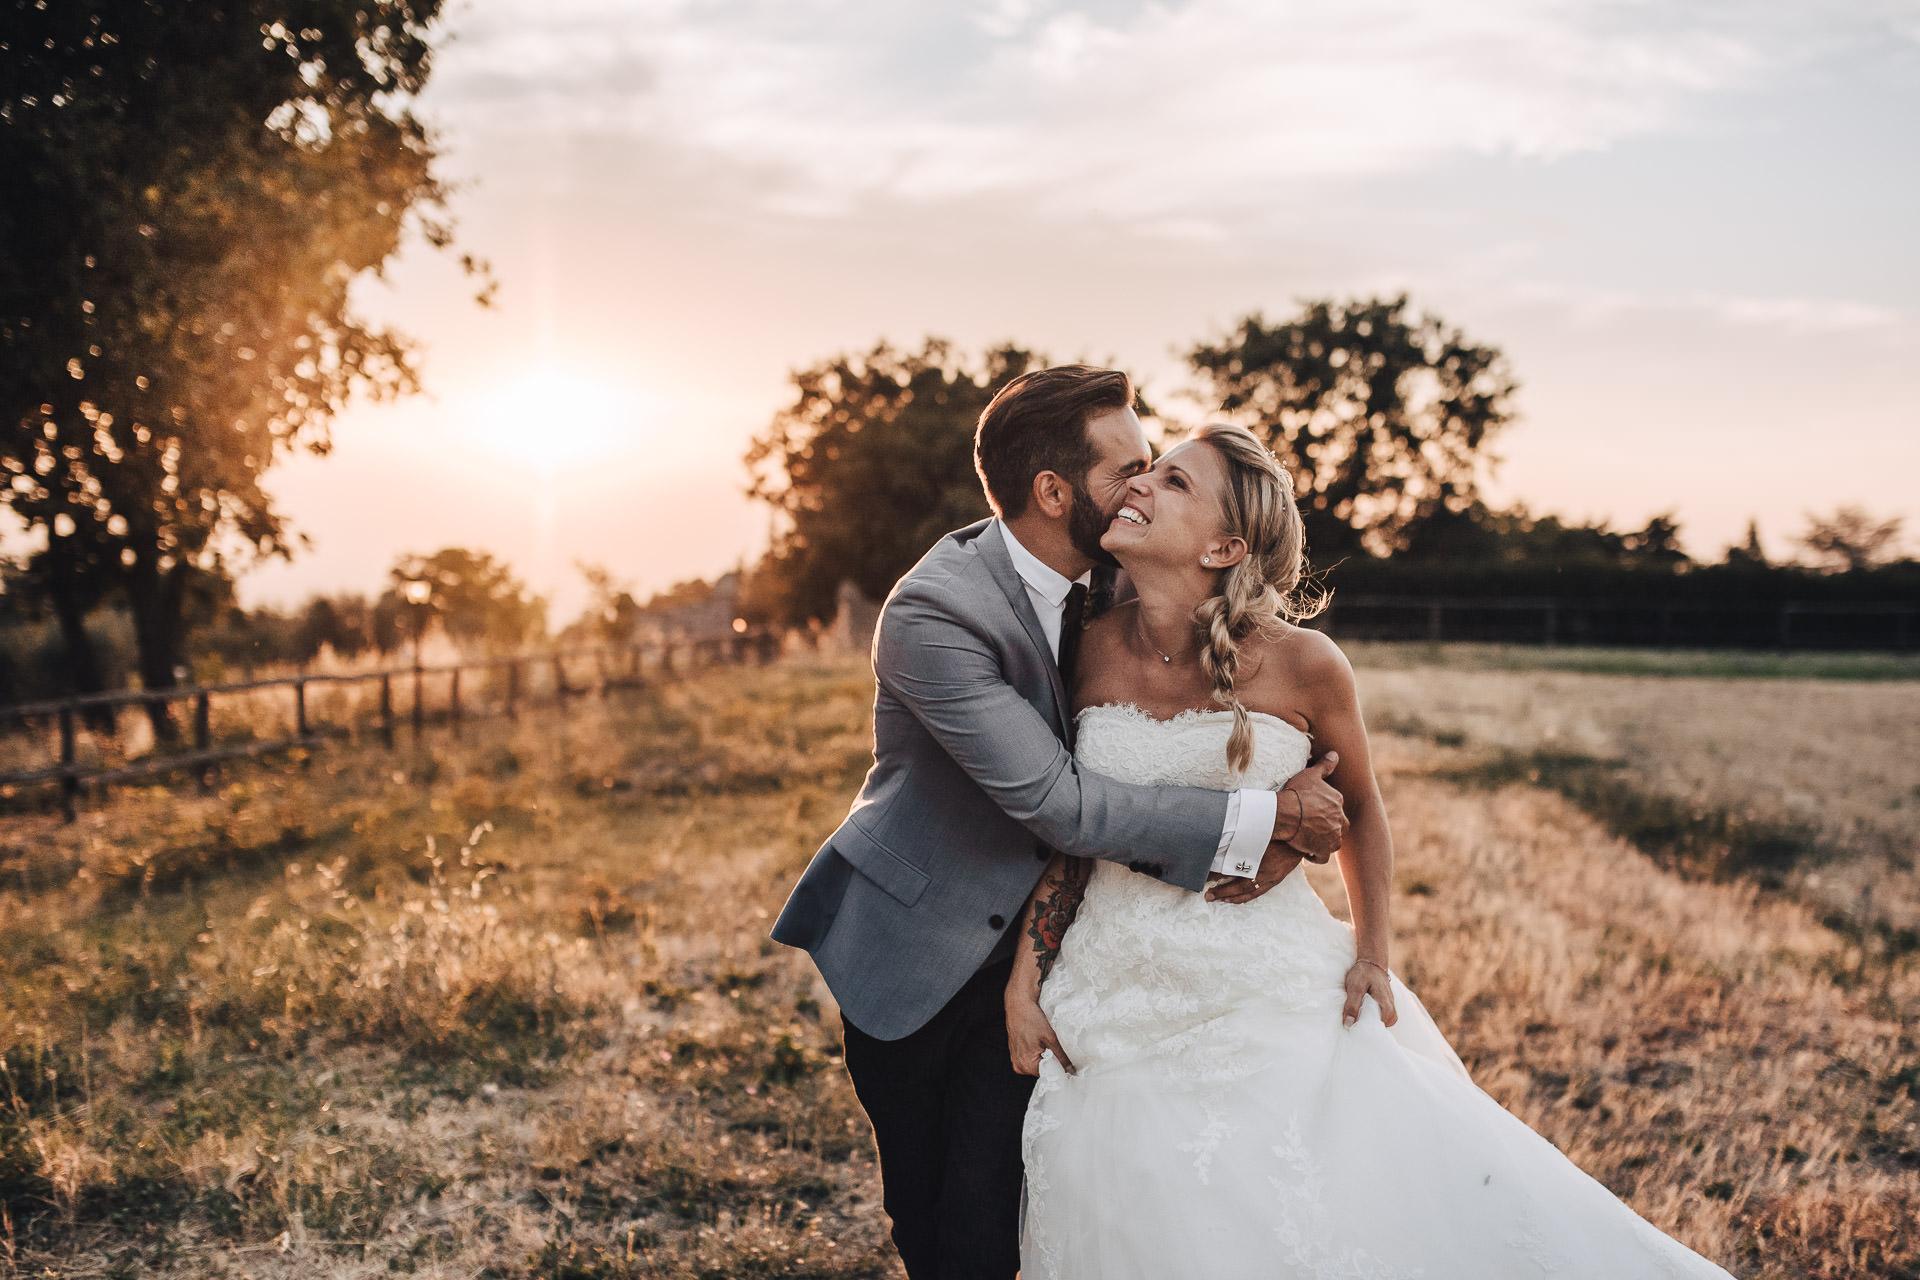 Matrimonio Boho nella natura